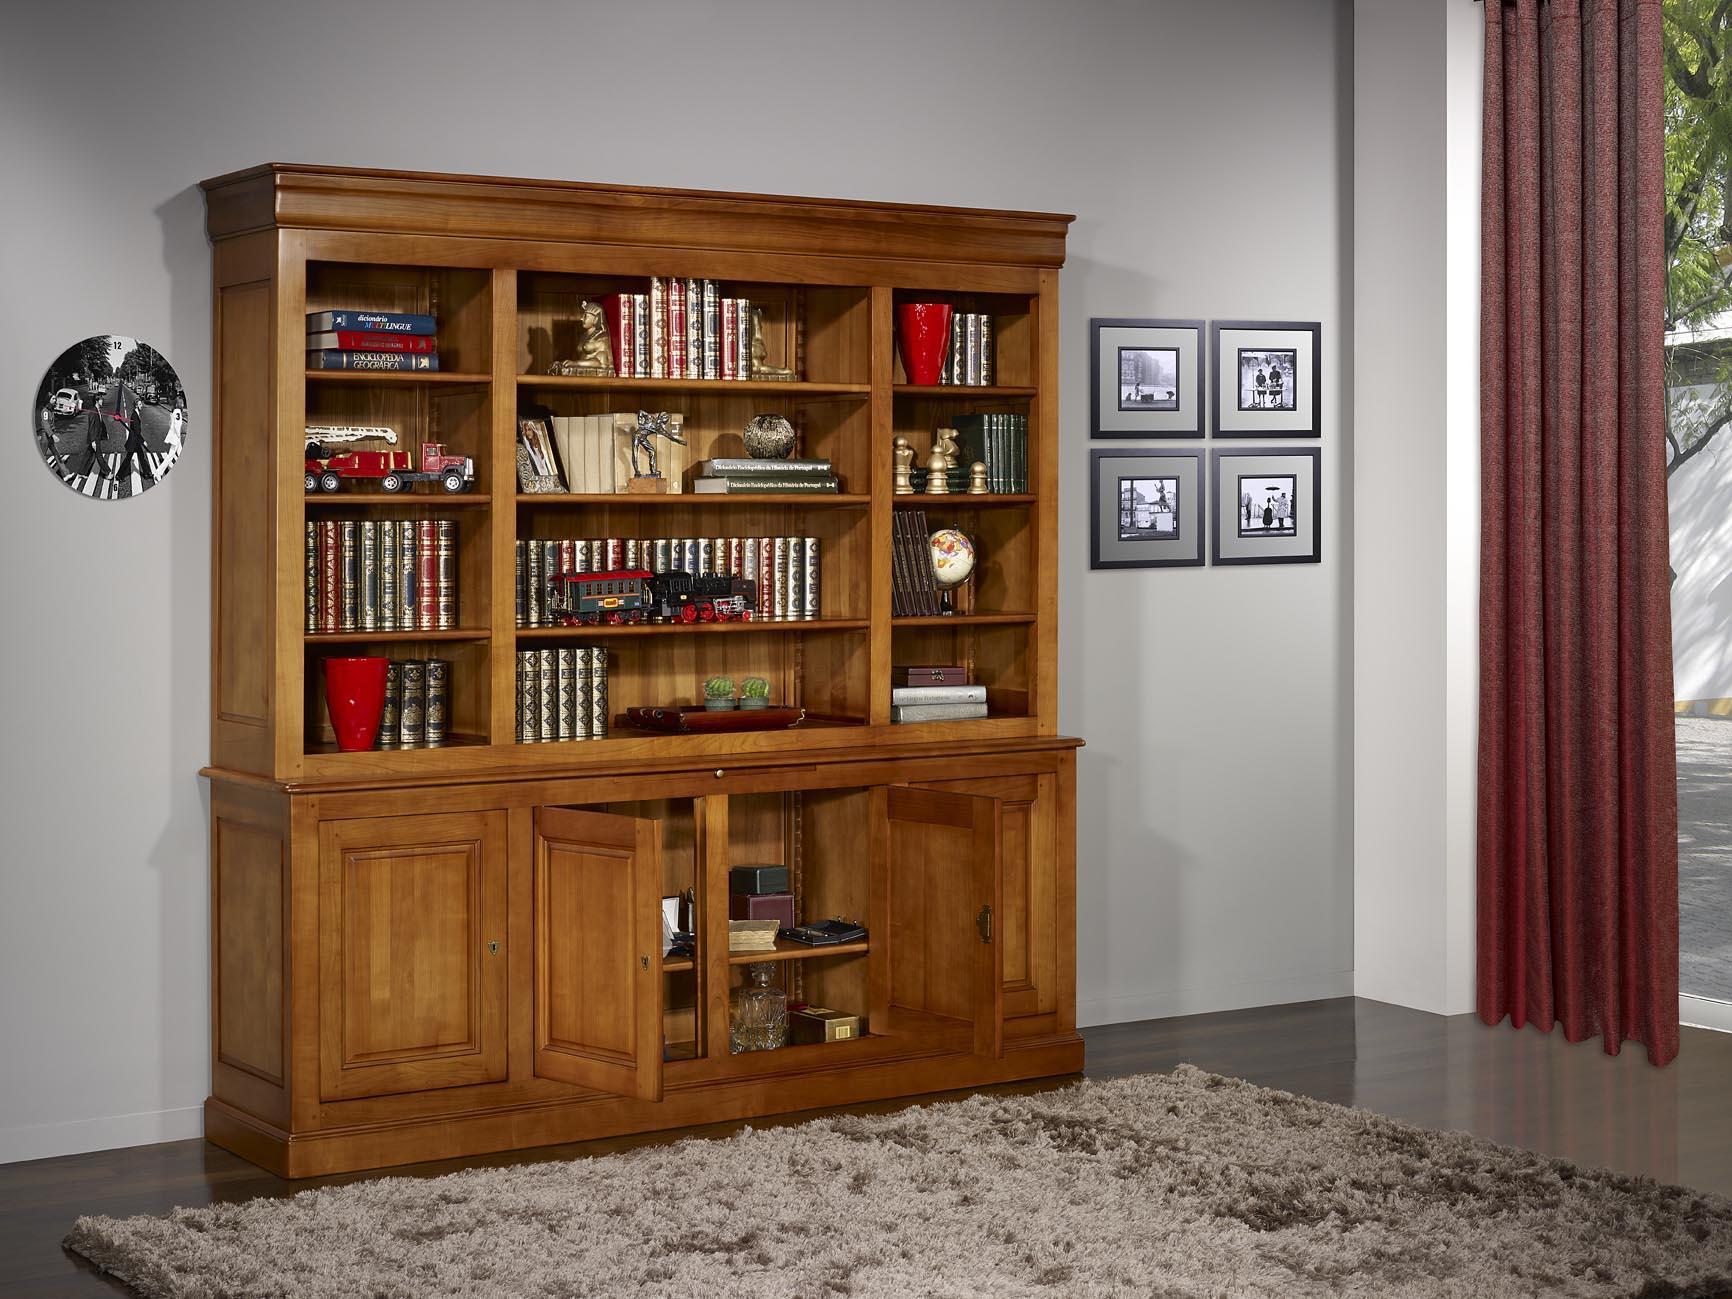 biblioth que 2 corps en merisier massif de style louis philippe meuble en merisier. Black Bedroom Furniture Sets. Home Design Ideas